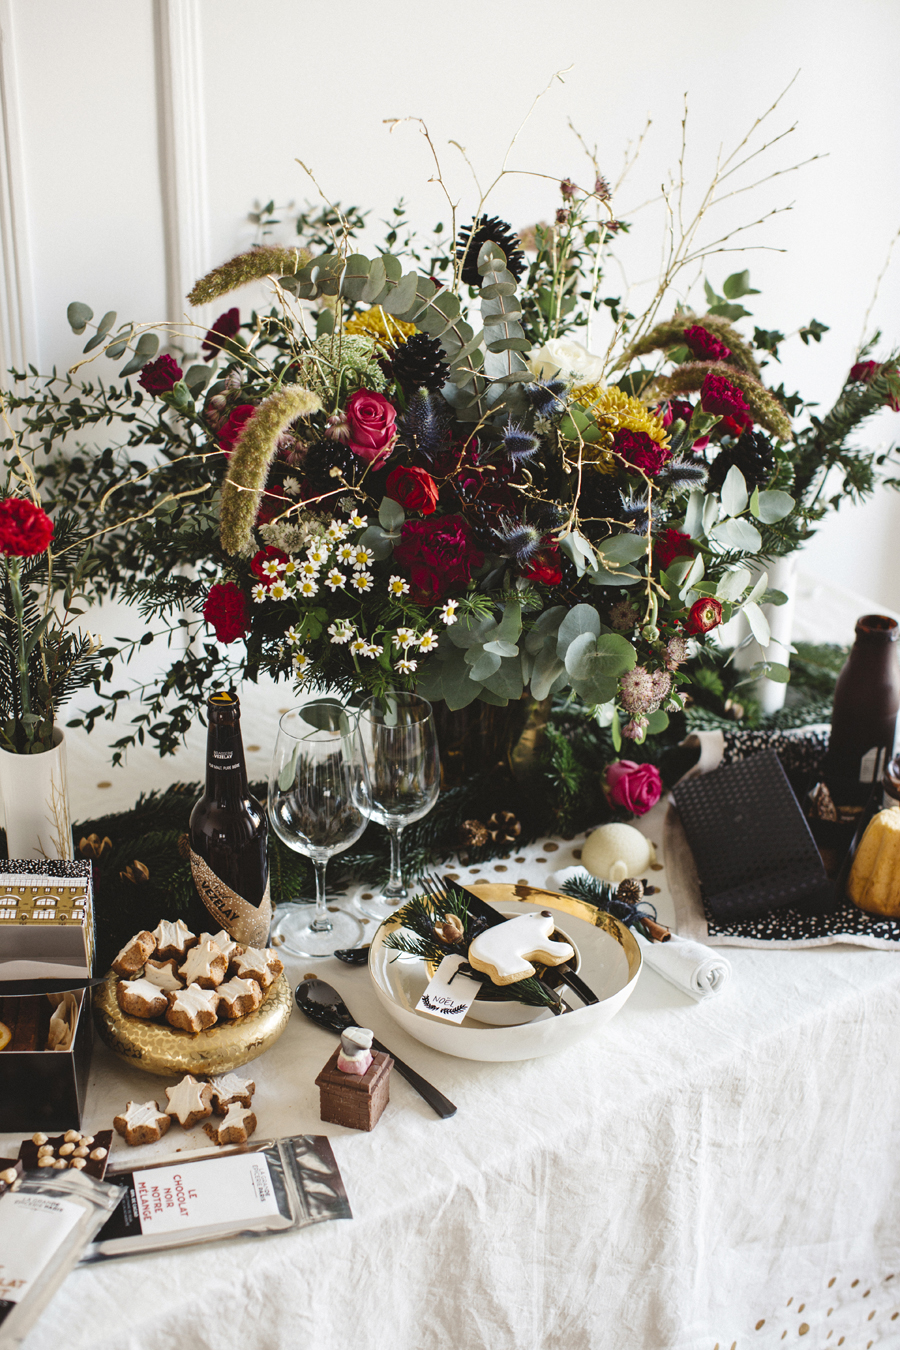 table_de_noel_food_la_grande_epicerie_le_bon_marche_25